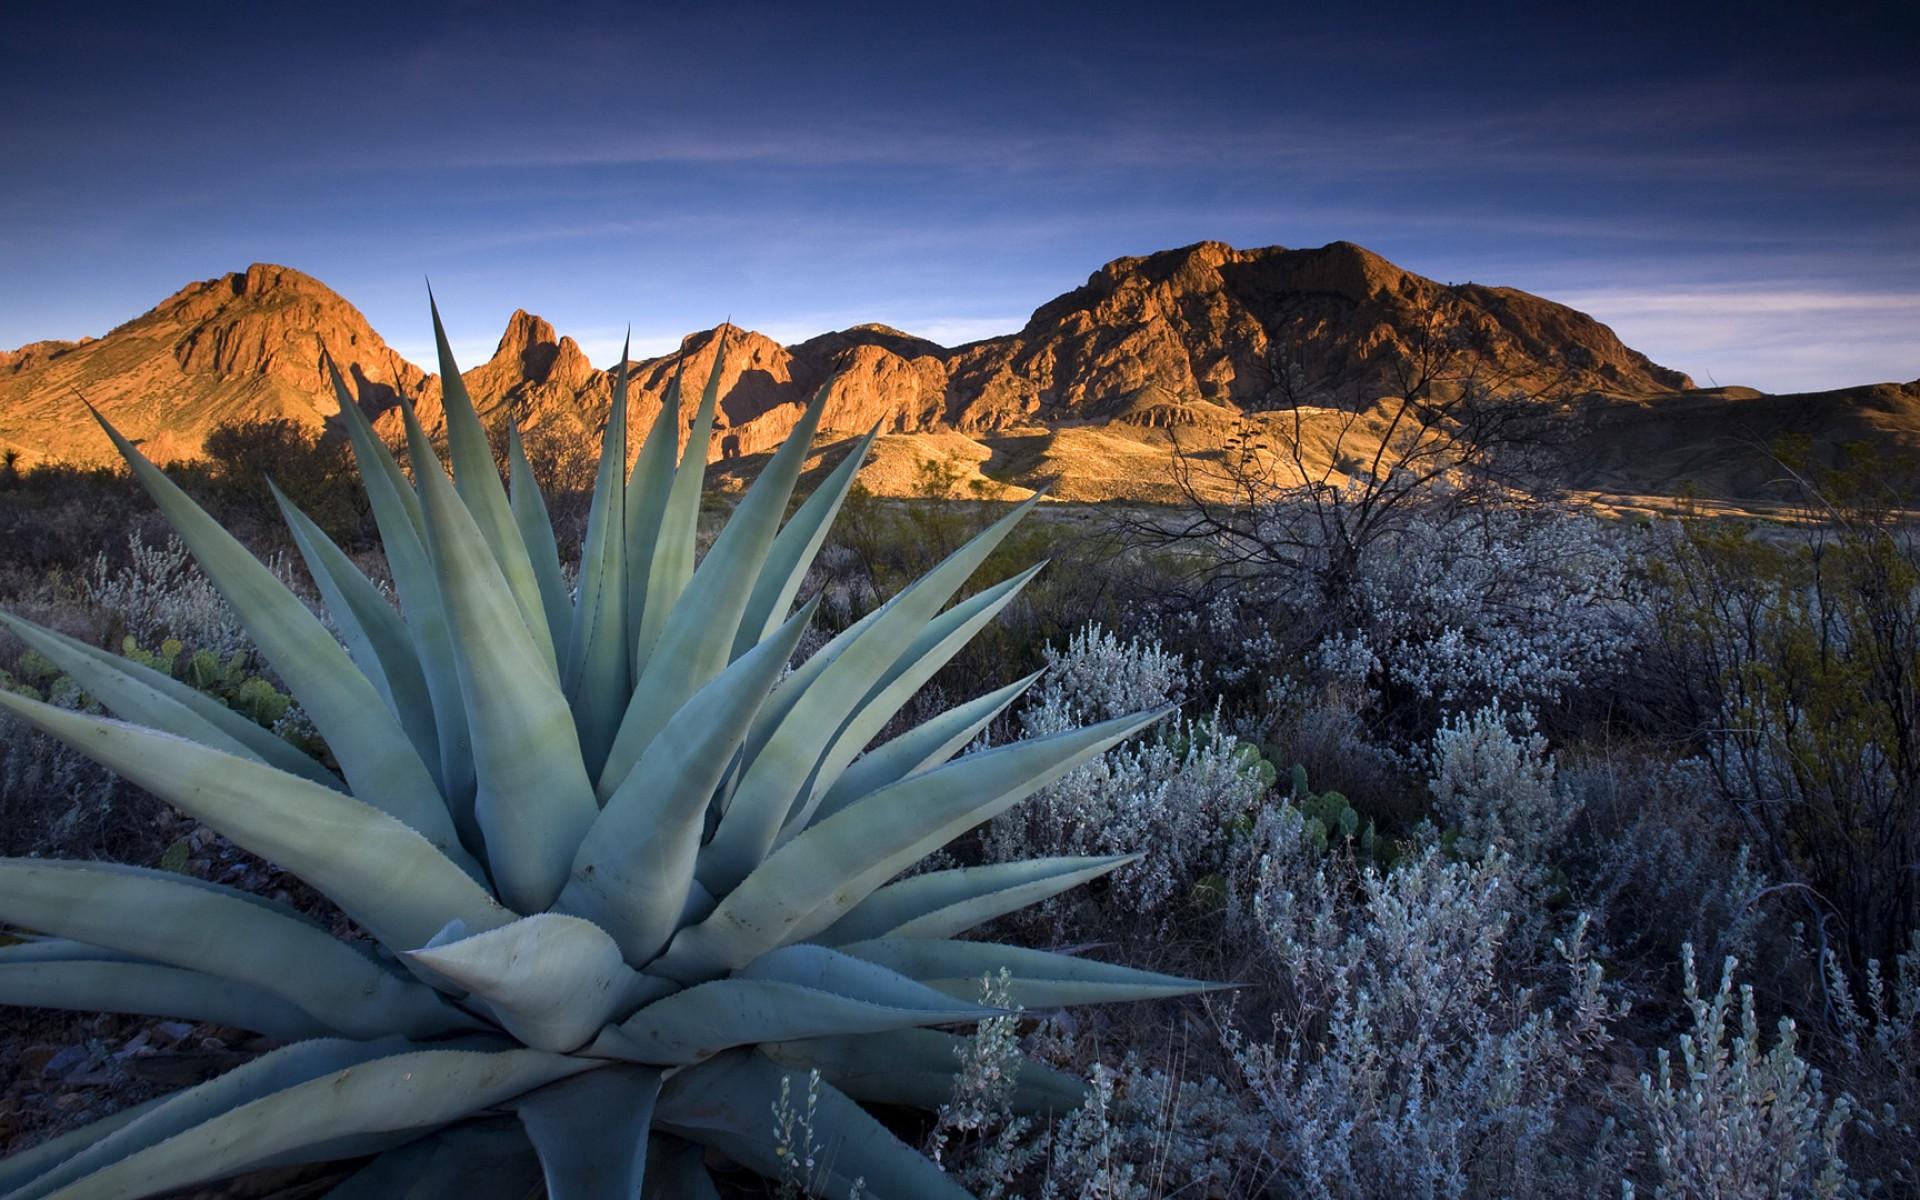 Blue Agave Tequila Plant aloe vera Full HD Fond...